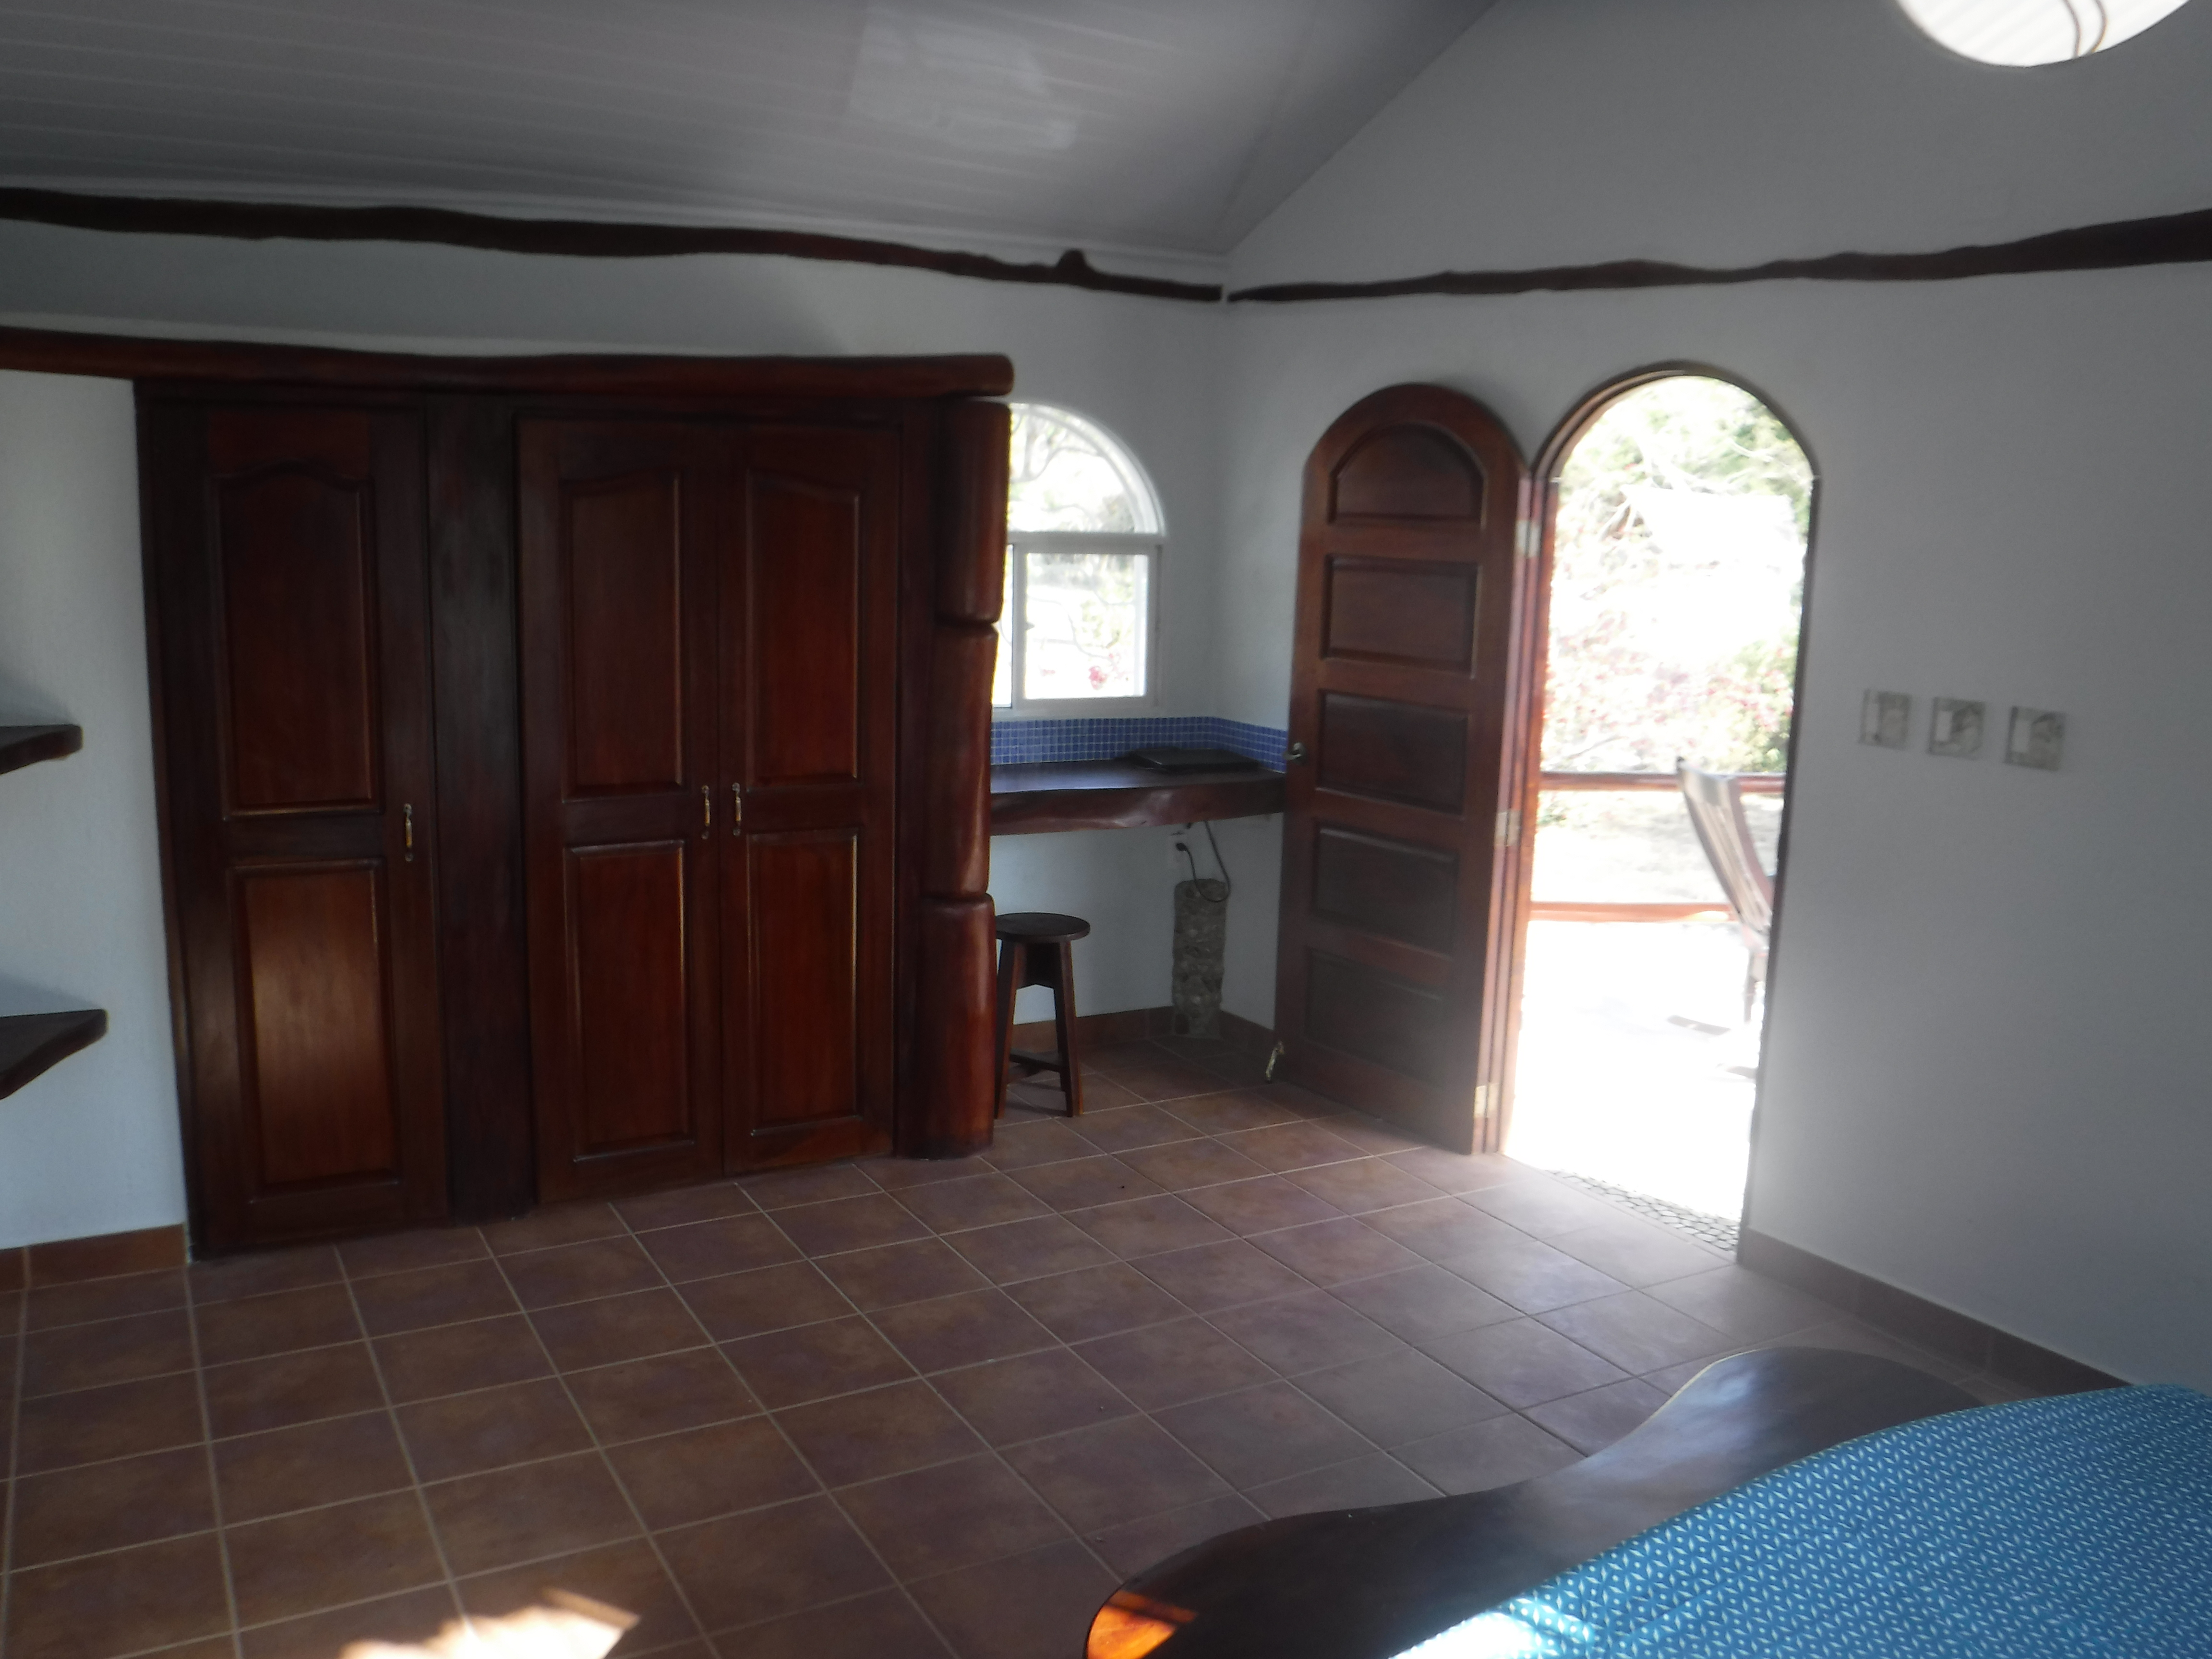 Prado Hills Update and OBrien Delicias Casa 052